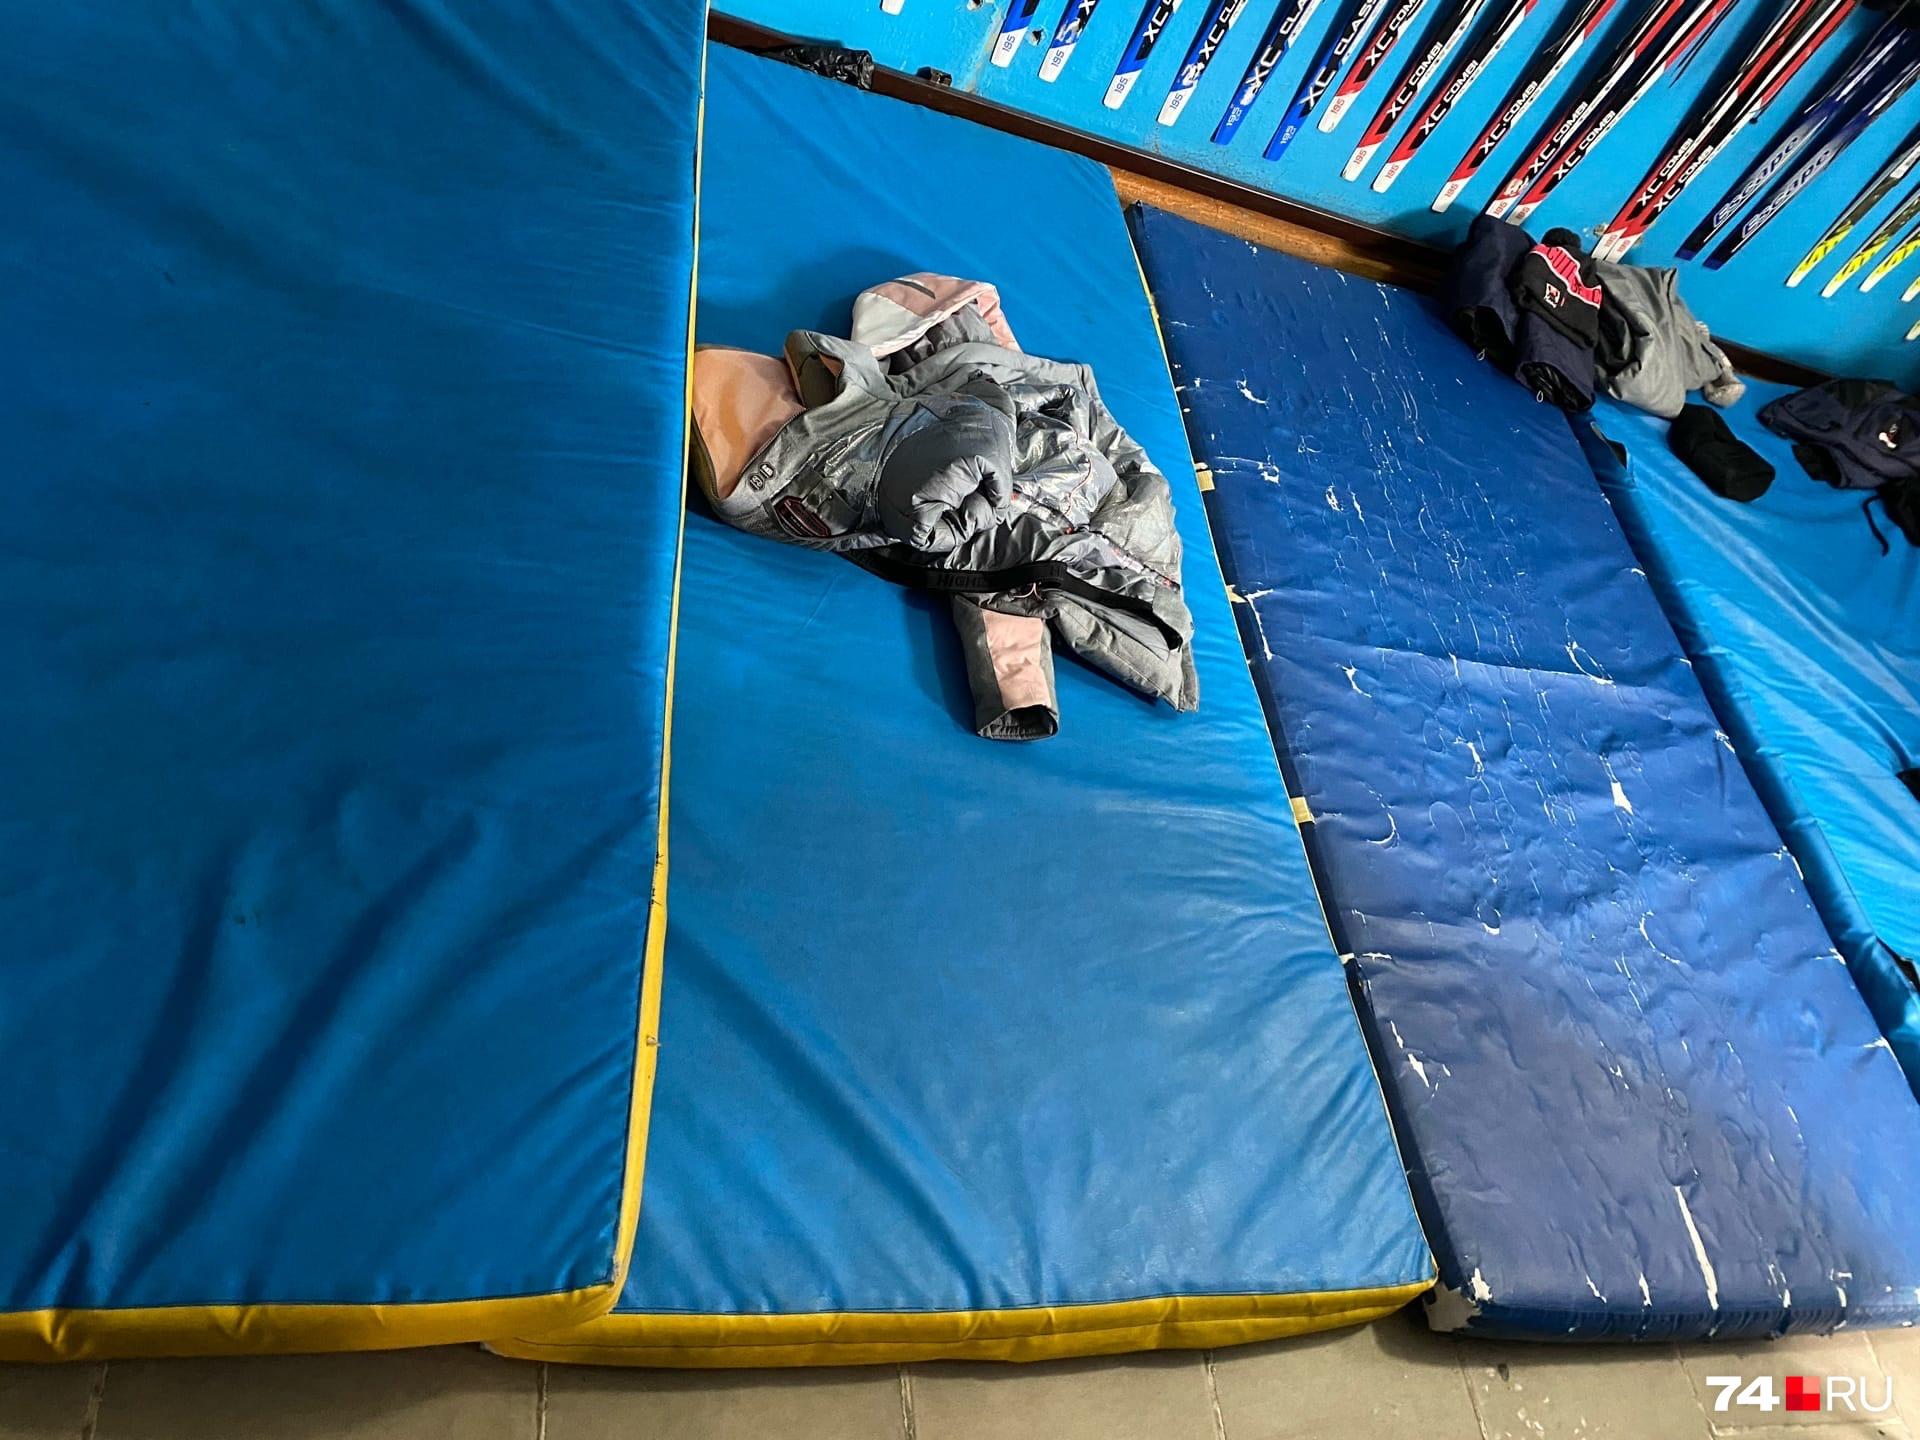 В спортзале люди спали на стареньких матах